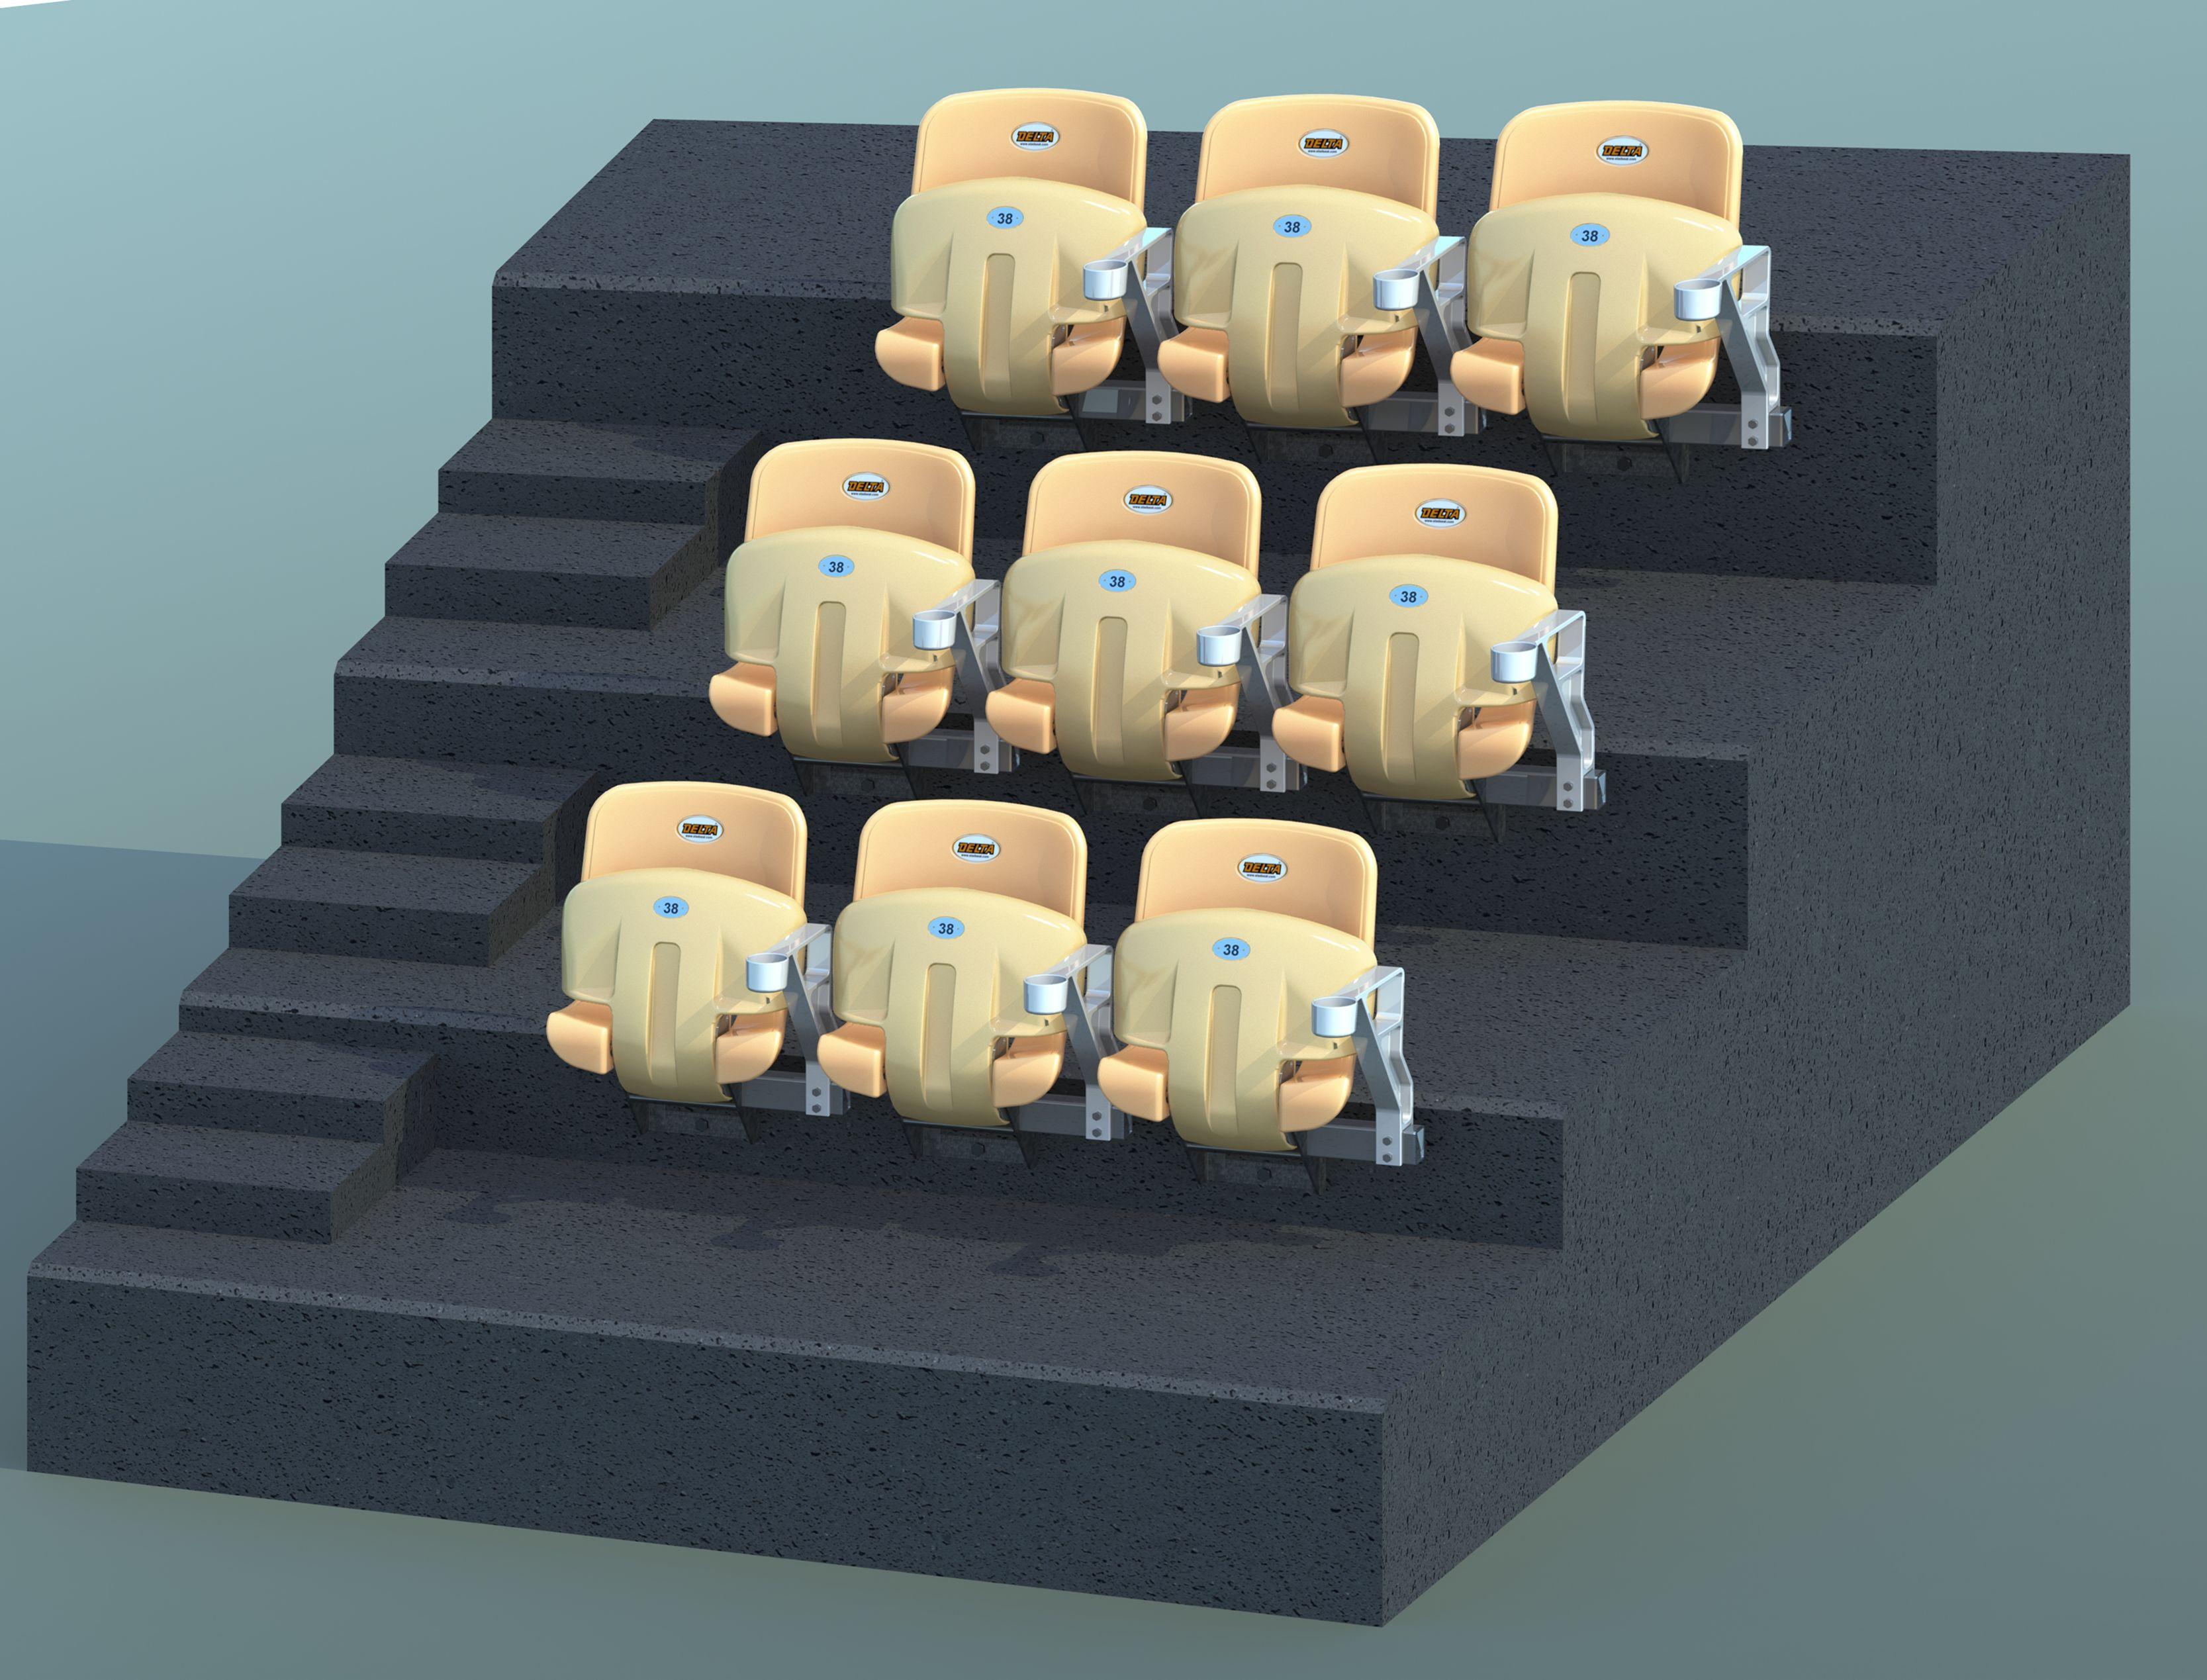 linea_backrest_monoblock_copolymer_pp_stadium_chair_seatorium_13